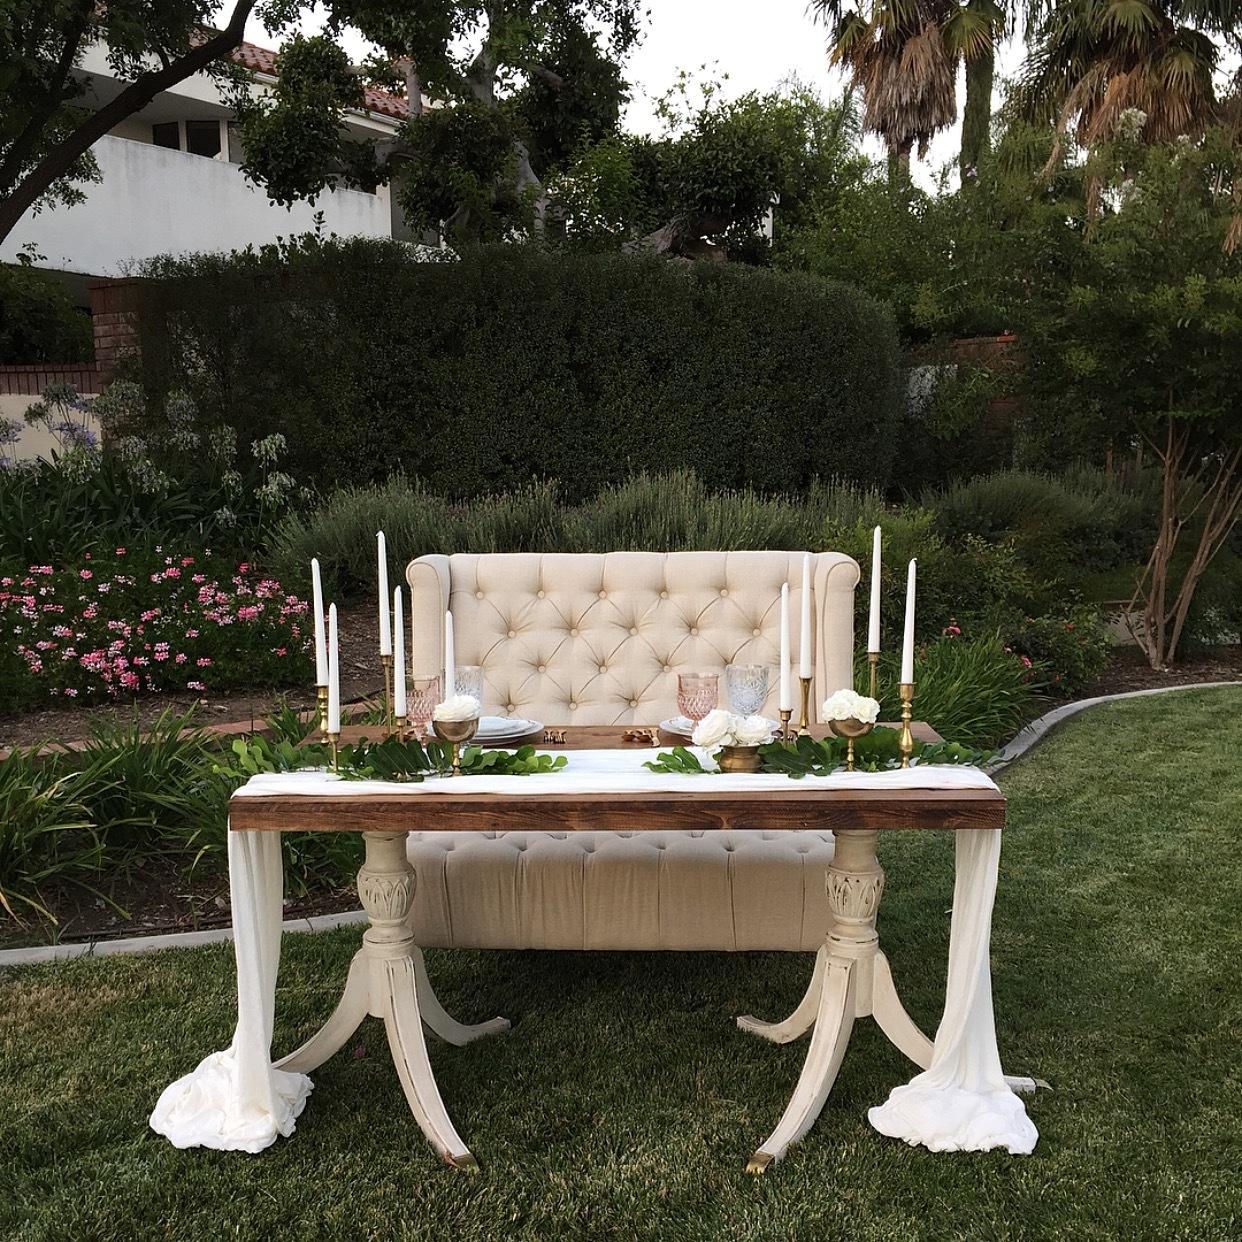 Architectural farm table romance